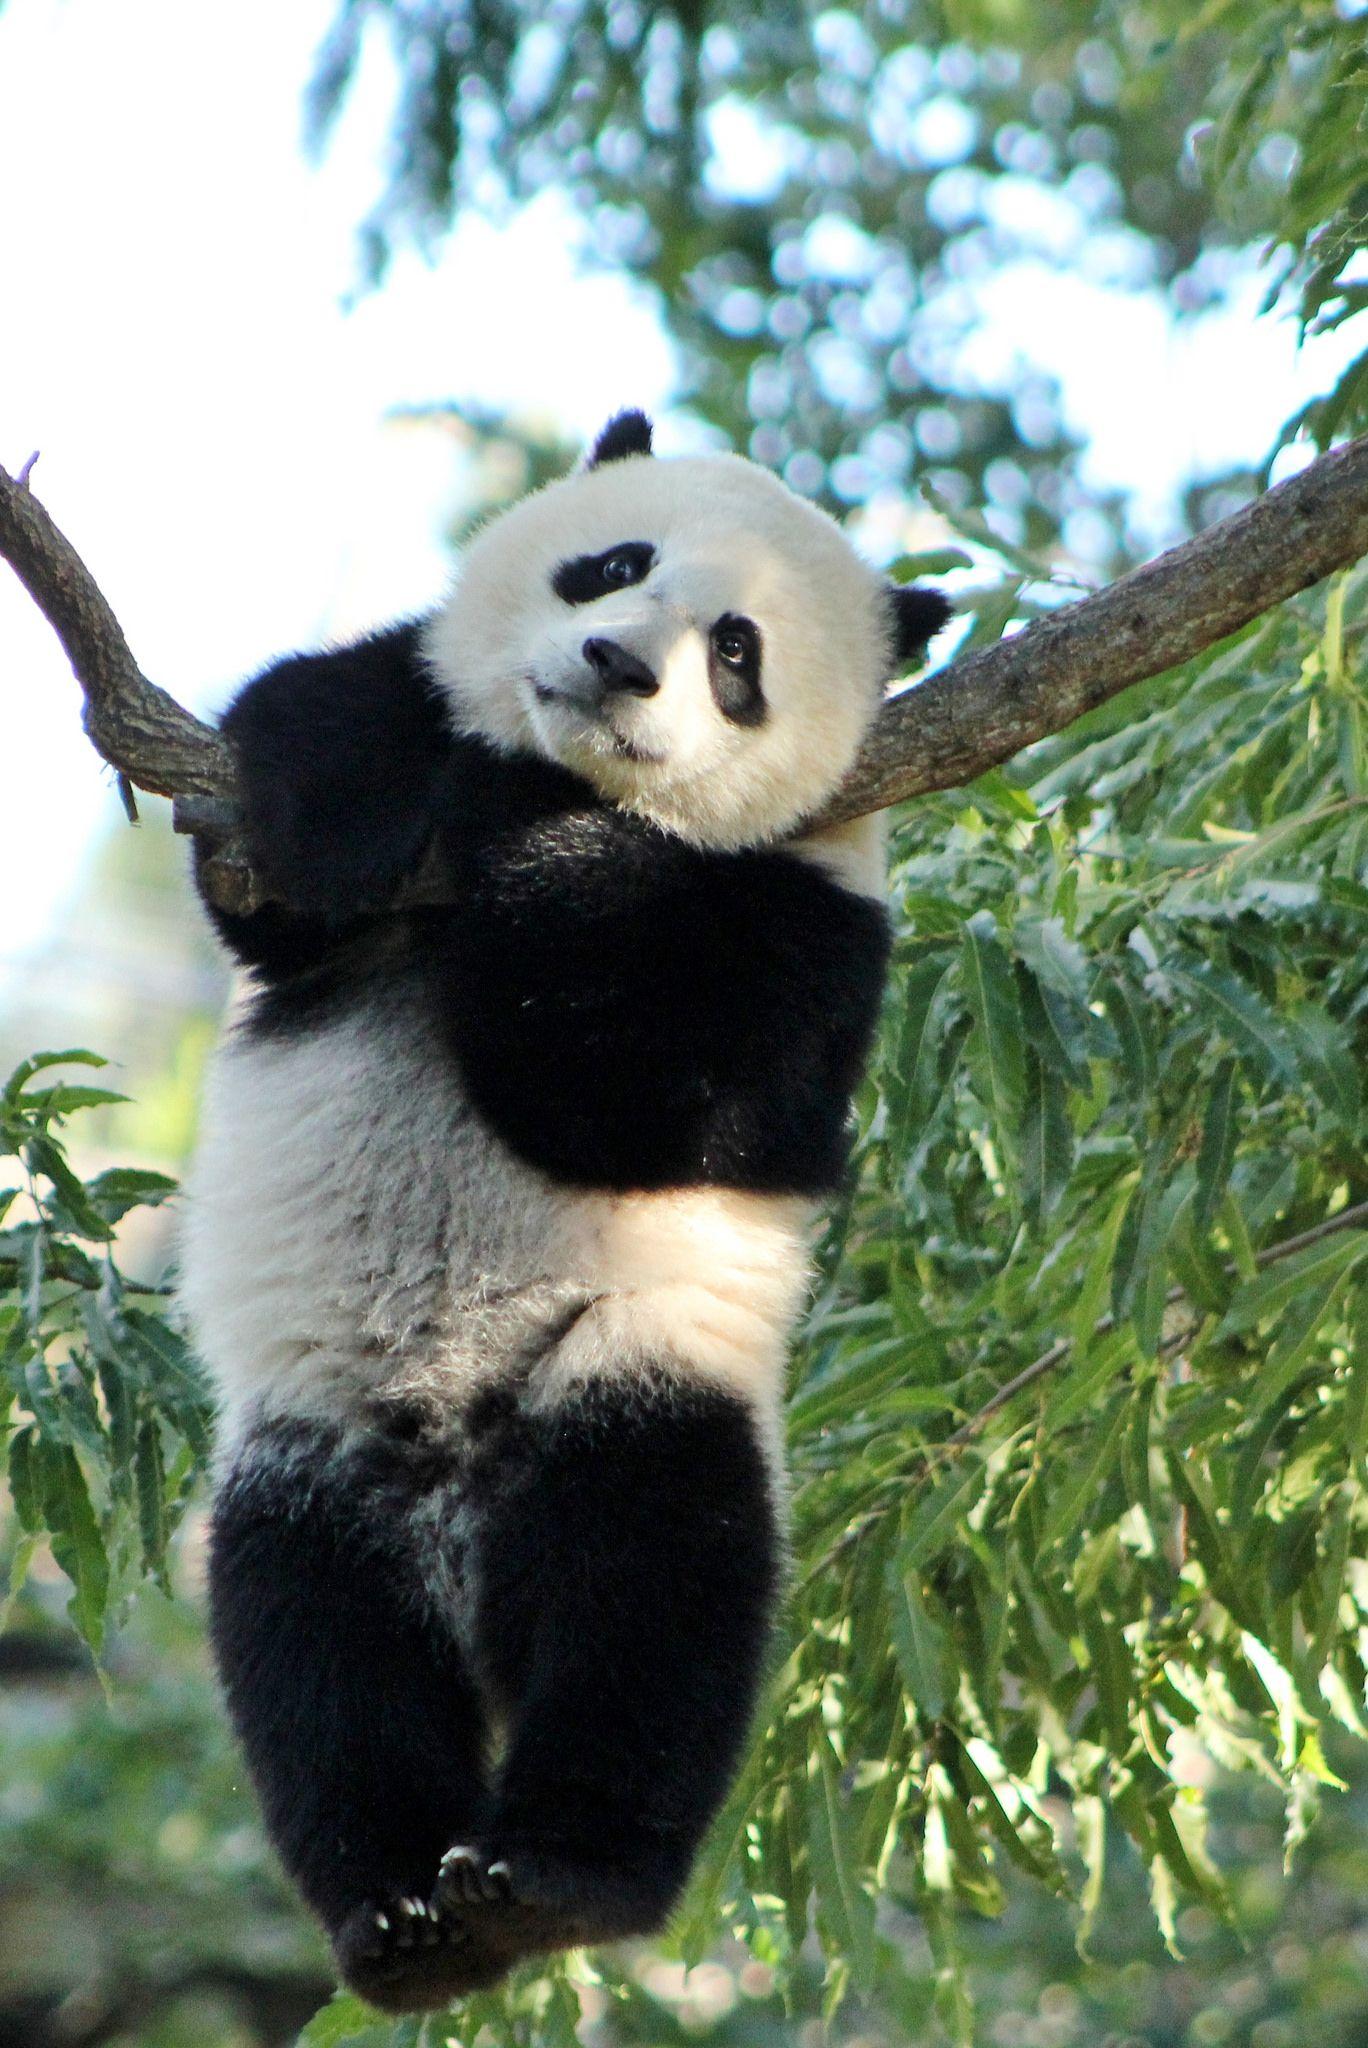 IMG_2489 | Baby panda bears, Panda, Cute animal pictures